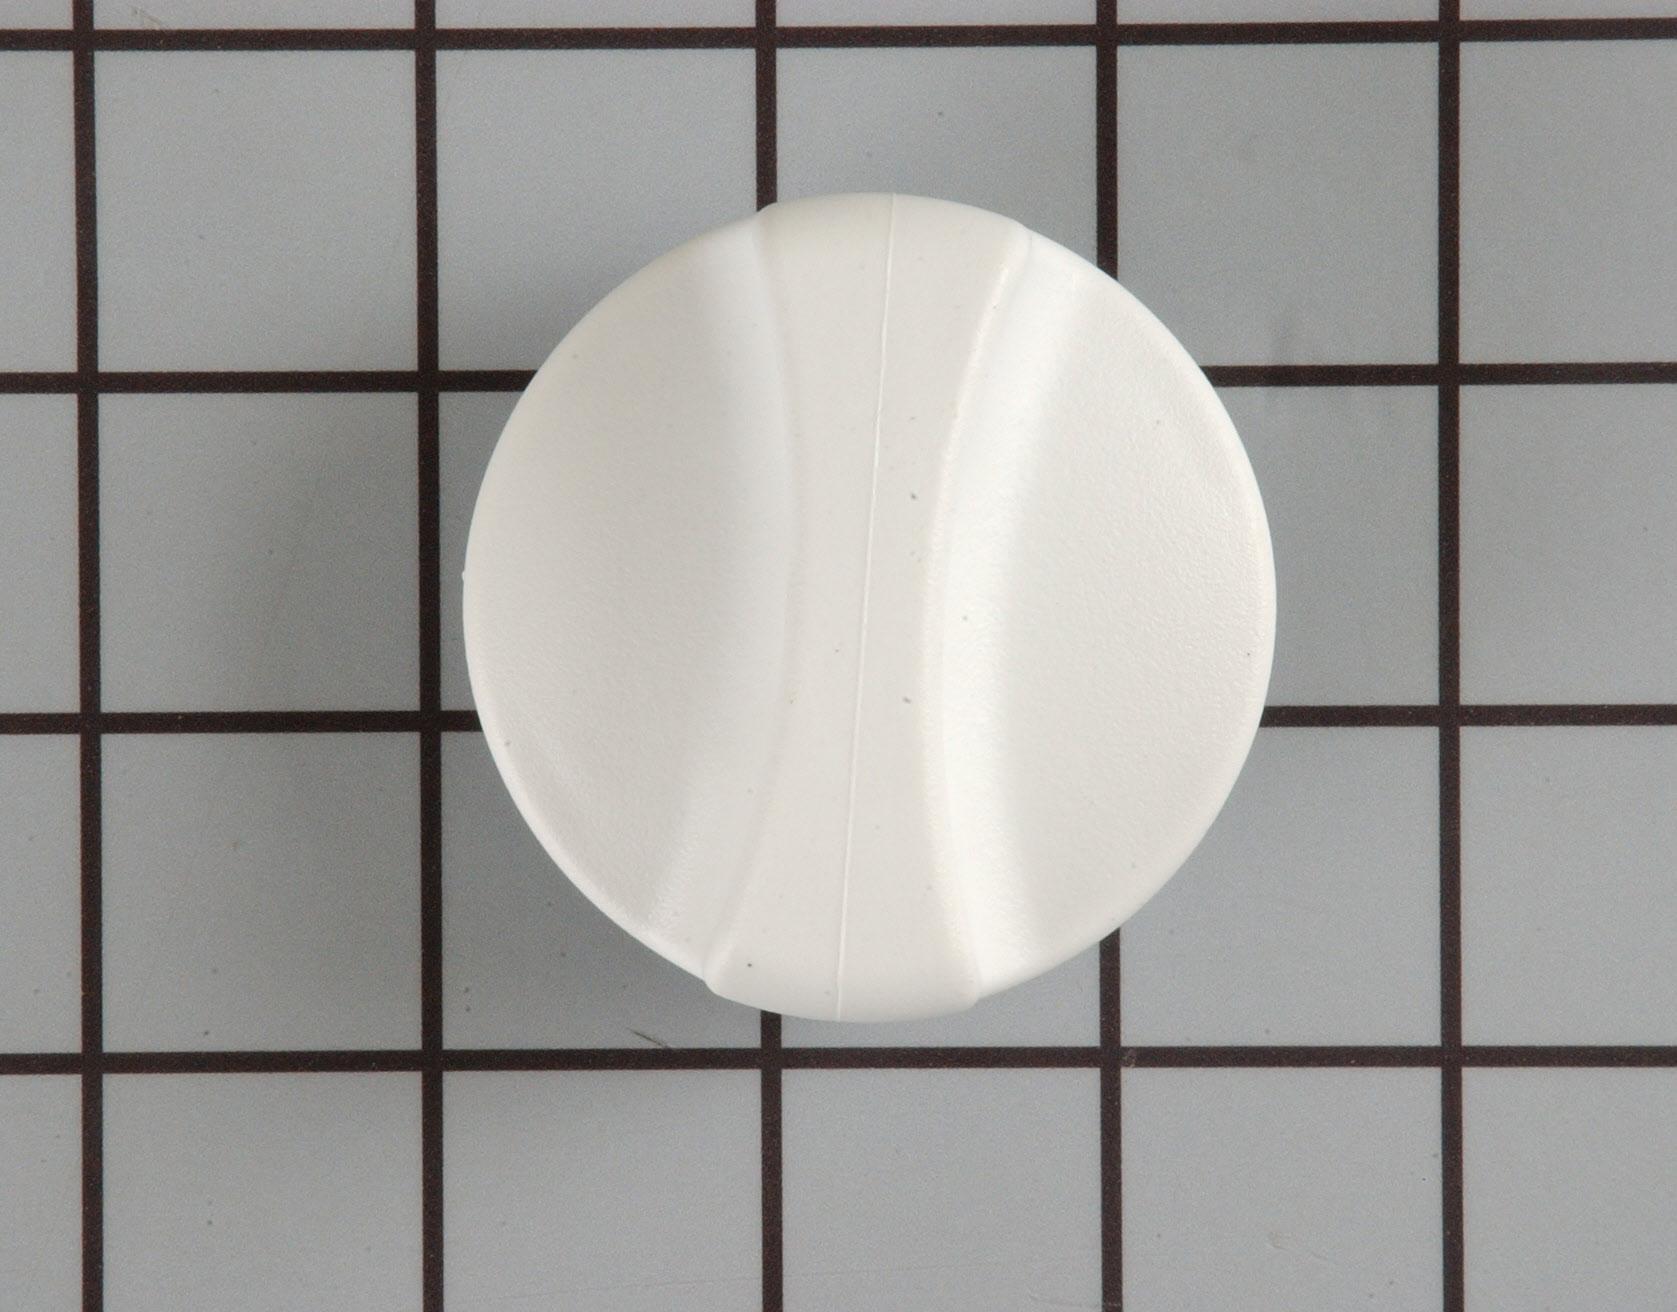 Estate Refrigerator Part # WP2186494W - Water Filter Cap